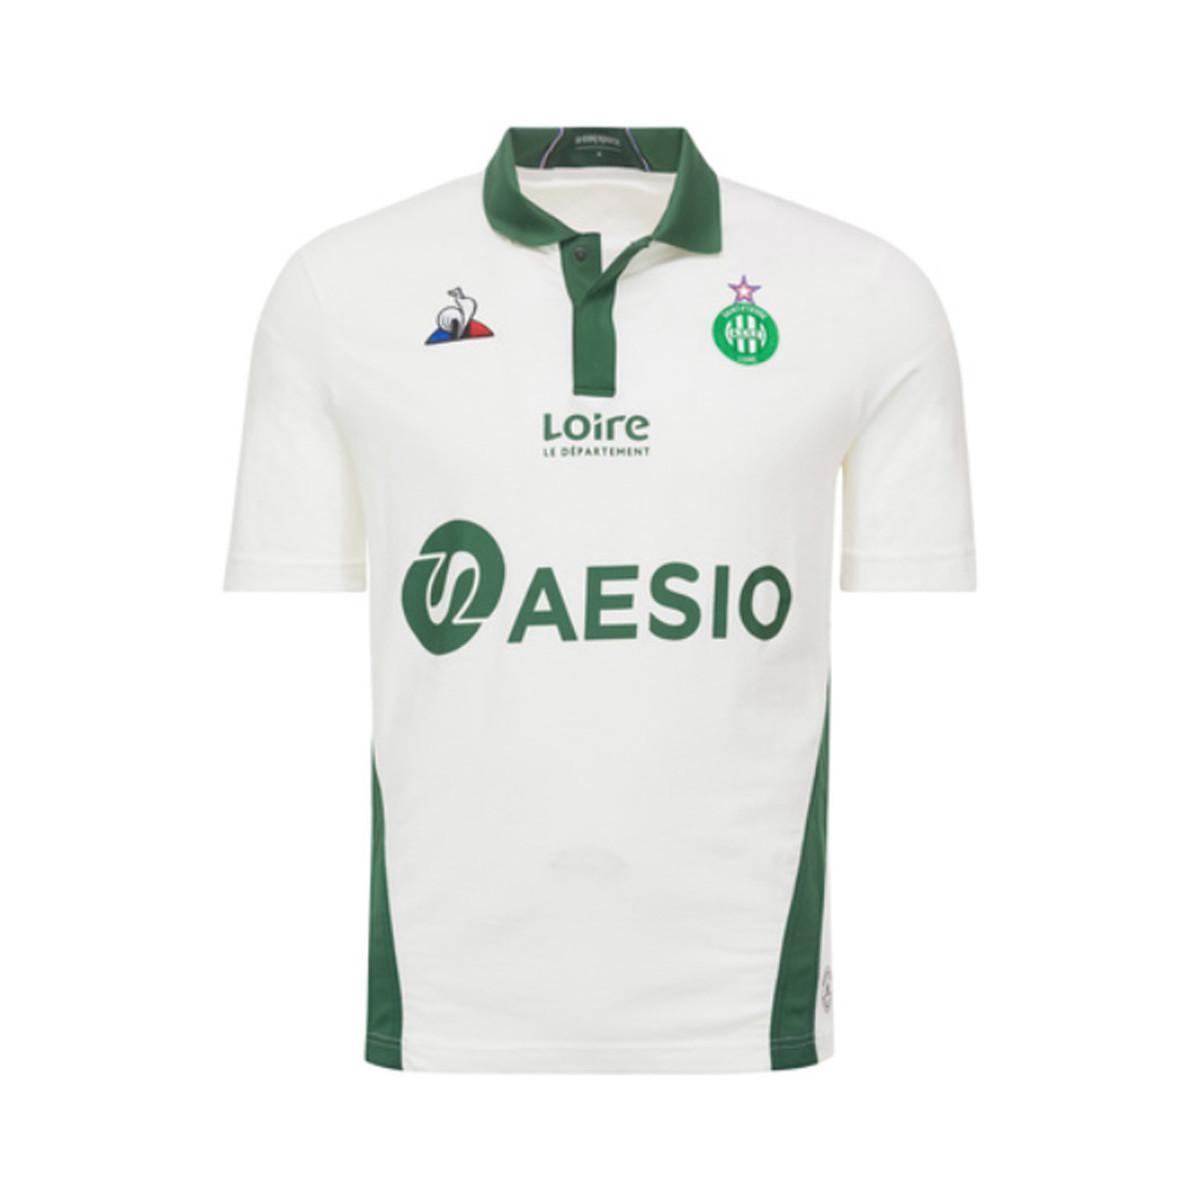 Le Coq Sportif. 2018-2019 St Etienne Away Football Shirt Women s T ... 1ae99d834